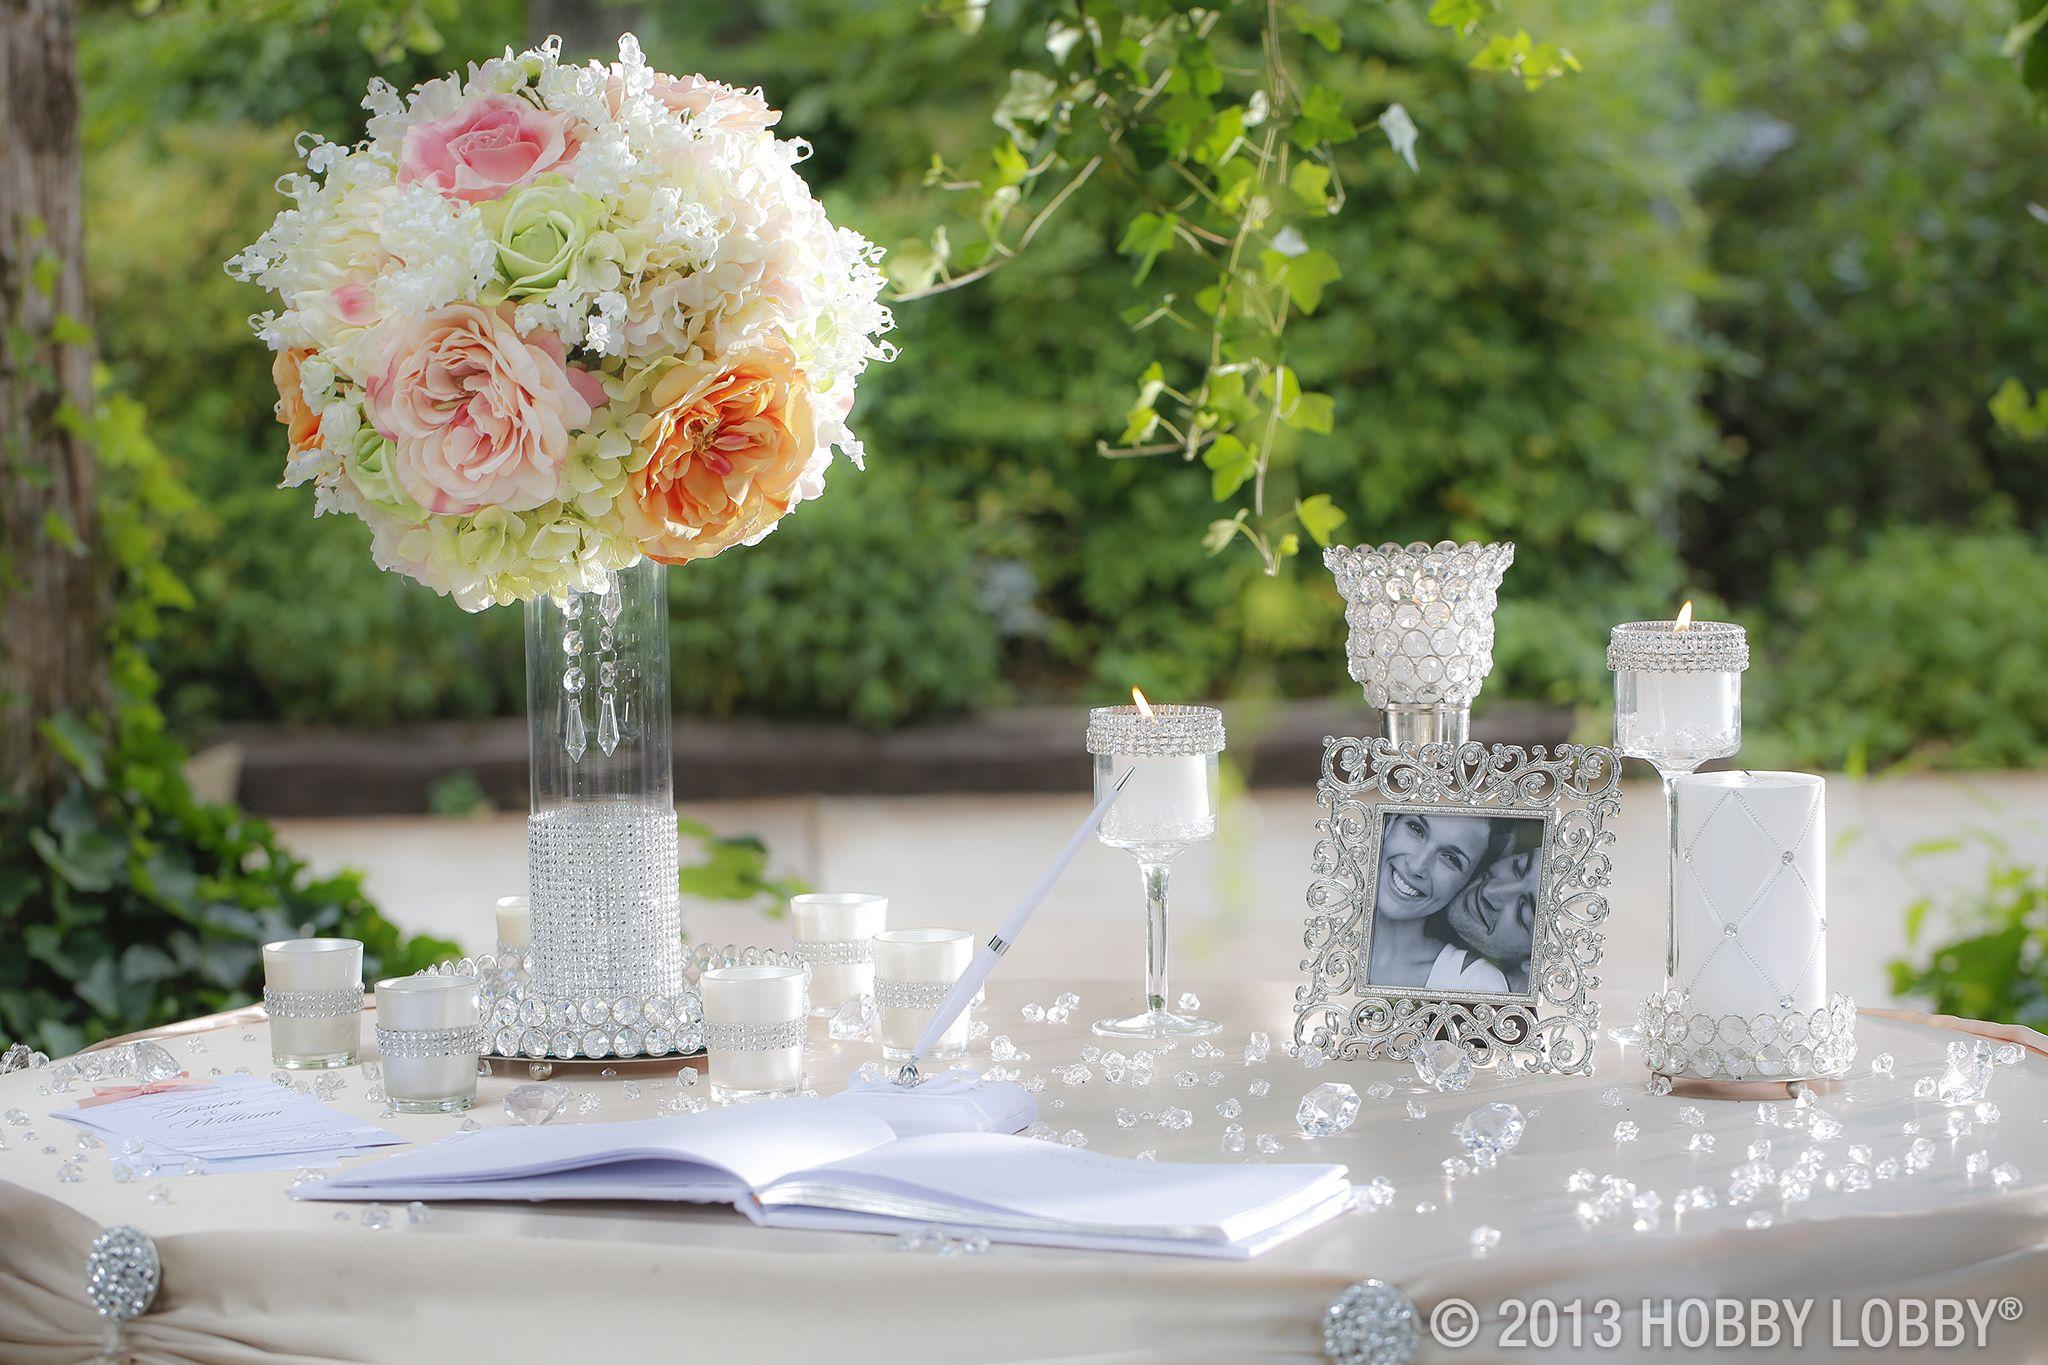 Pin by Hobby Lobby on A Glittering Affair Wedding  Pinterest